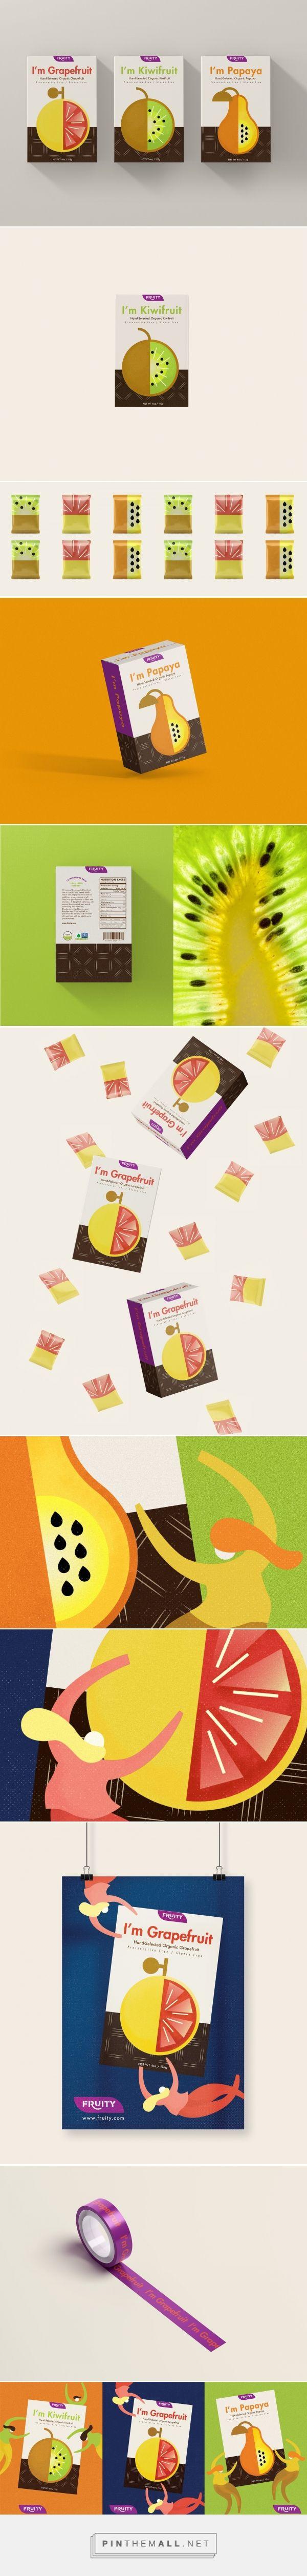 Fruity Dried Fruit Snack packaging design concept by Zhaoyi Wang - http://www.packagingoftheworld.com/2018/01/fruity-dried-fruit-snack.html